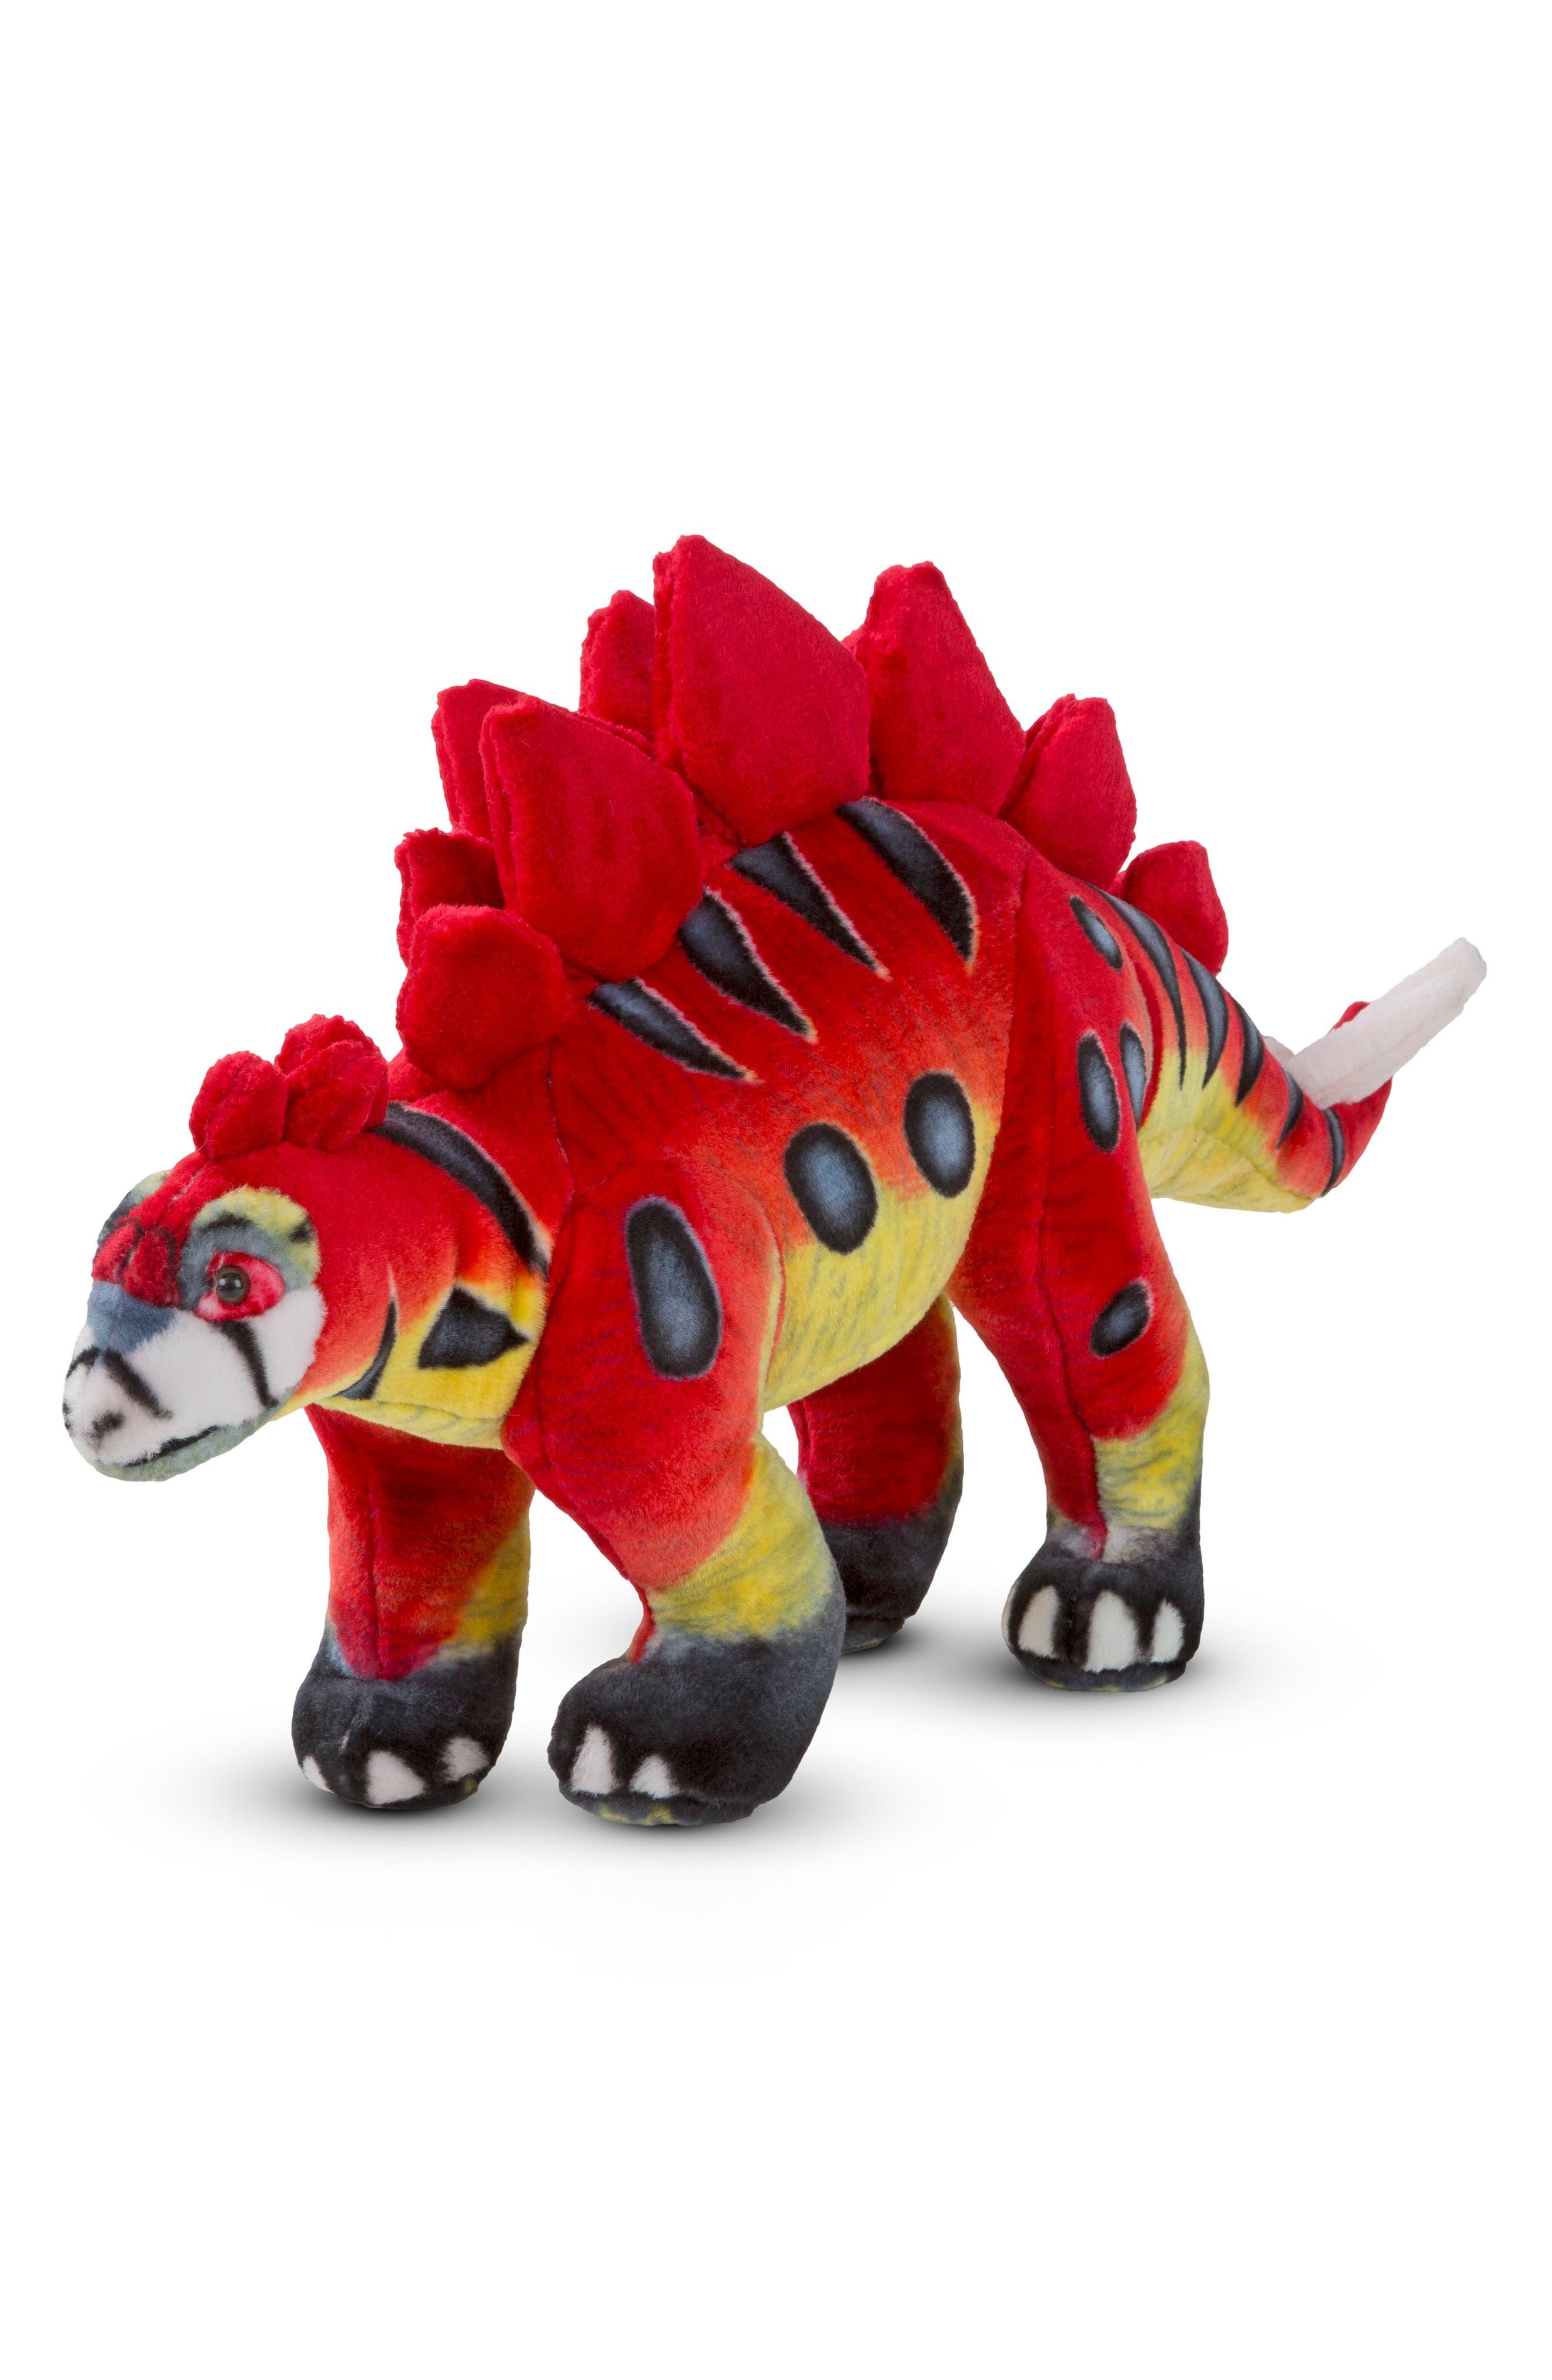 Melissa & Doug Giant Stegosaurus Plush